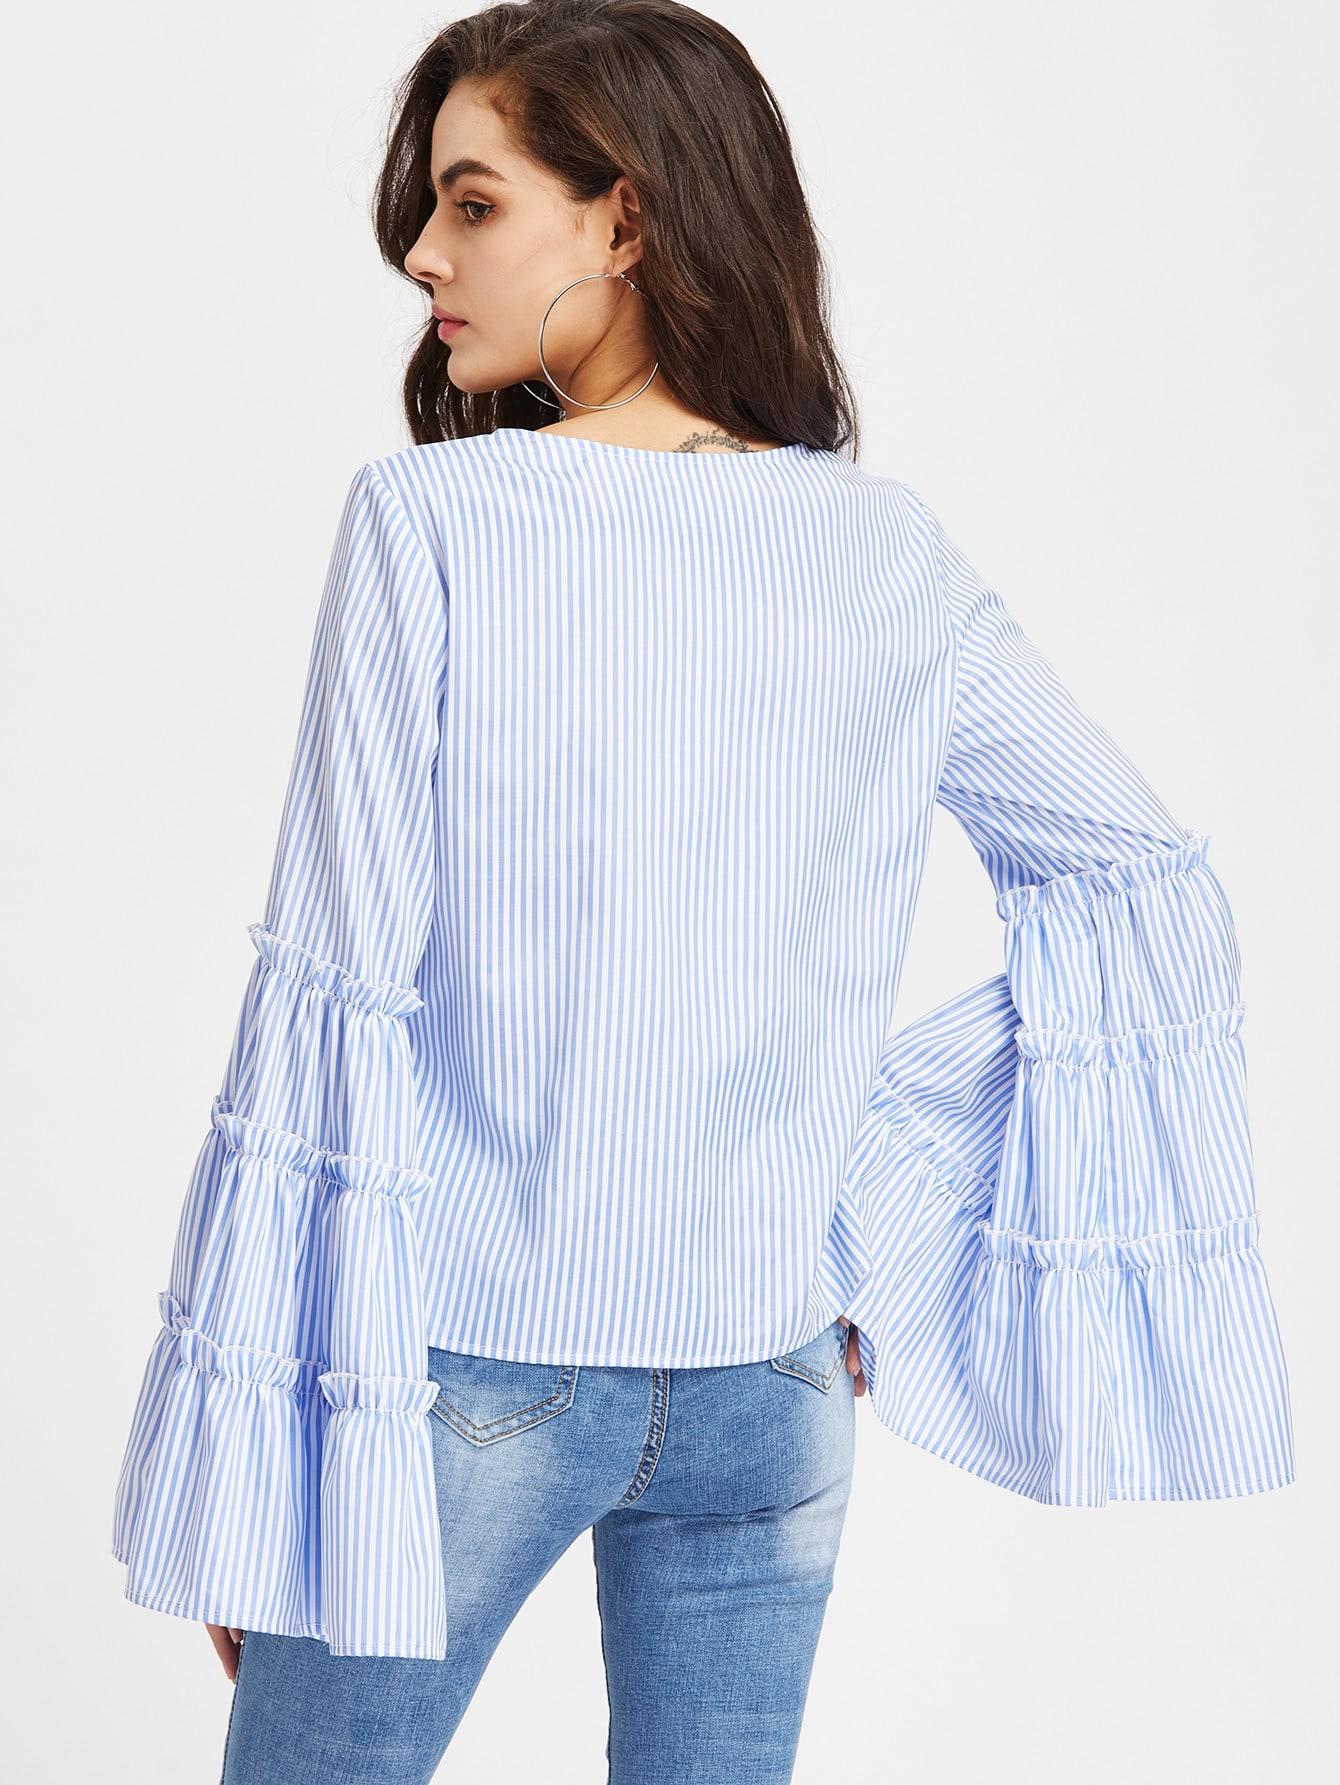 blouse170428708_2